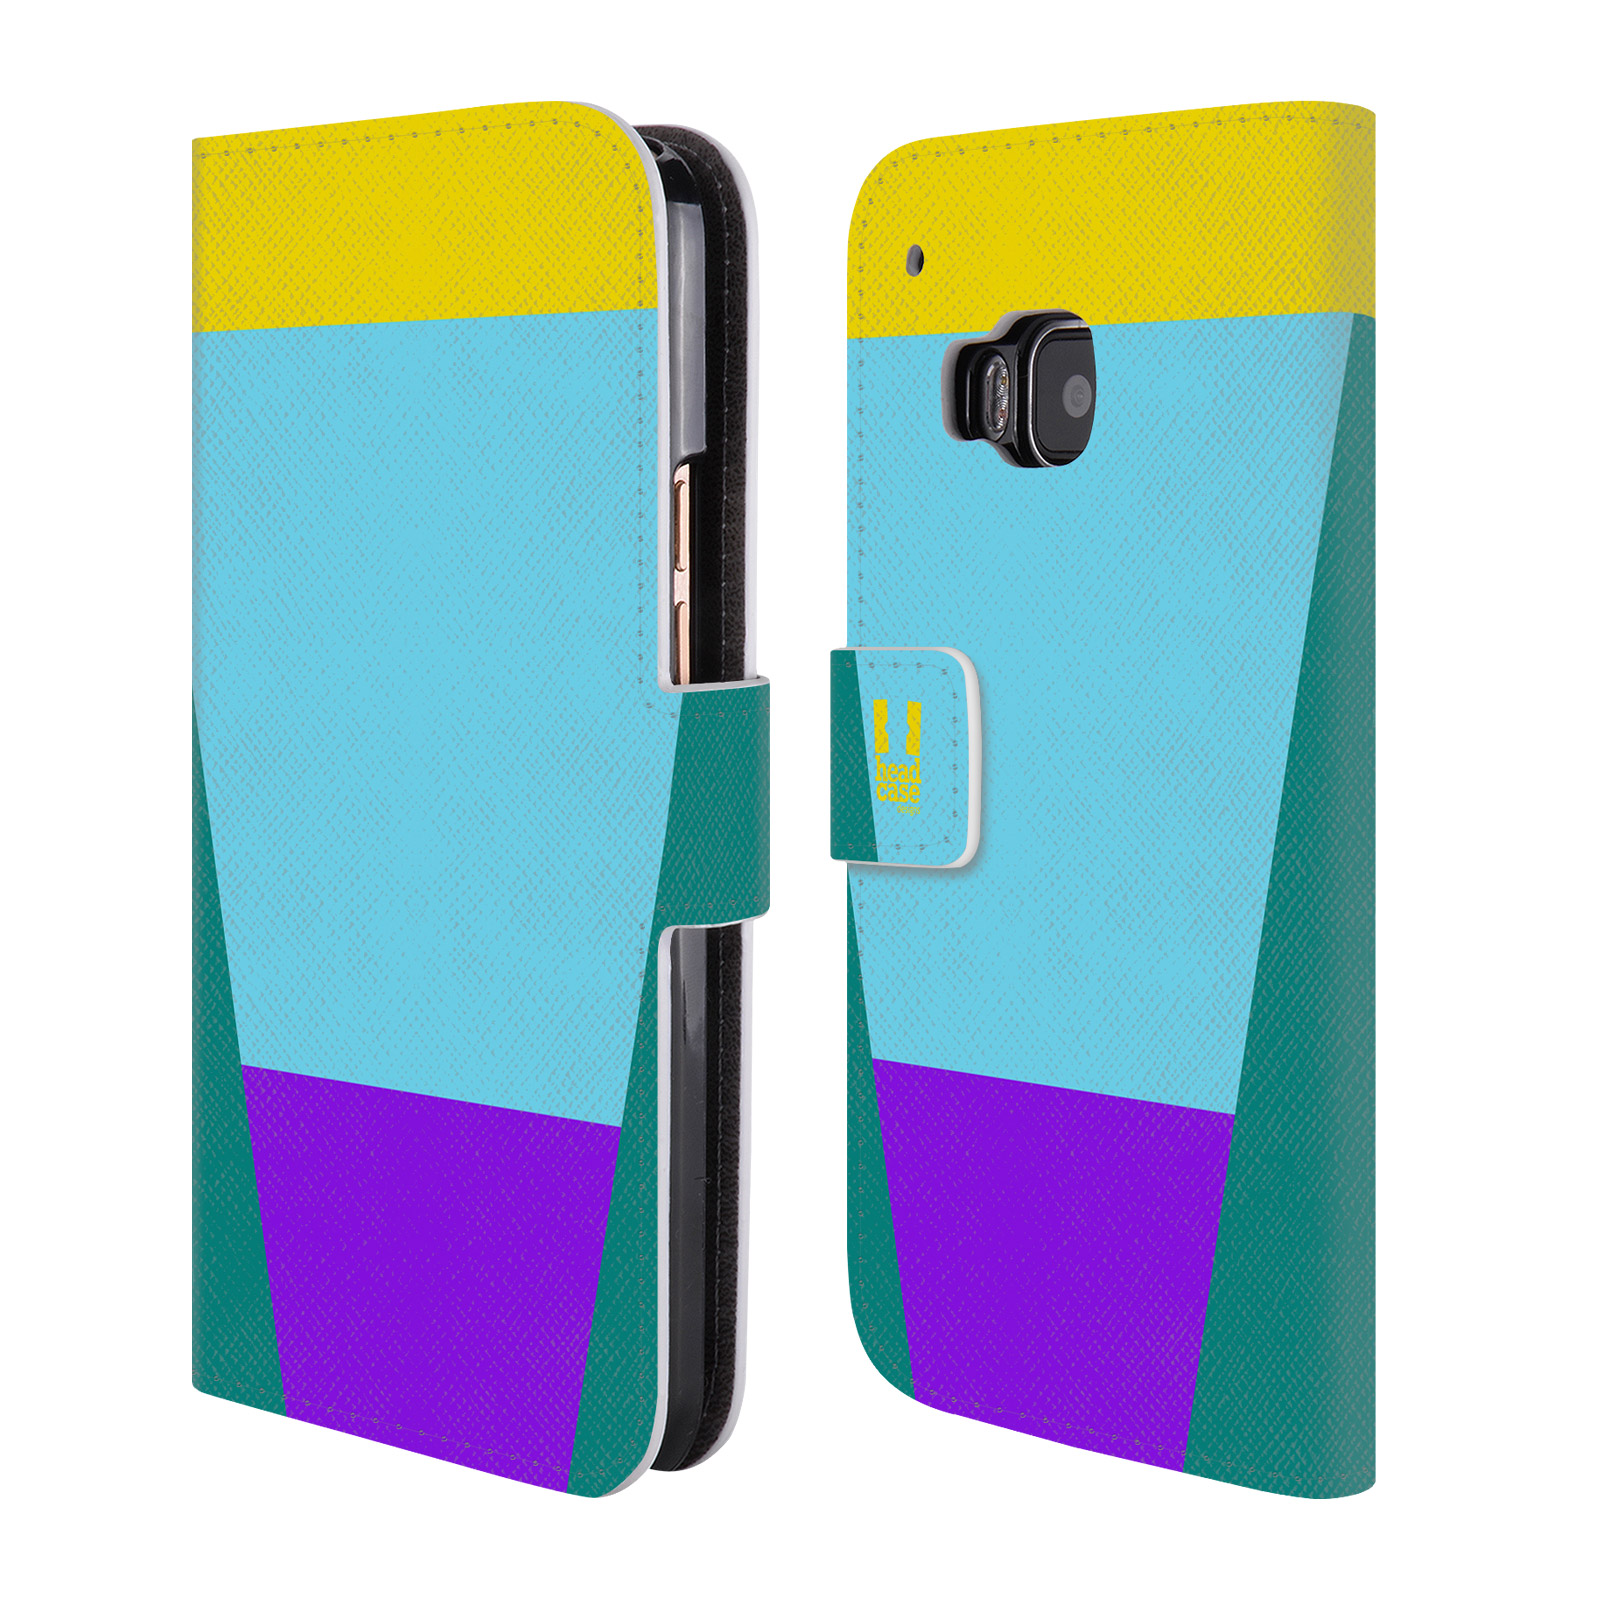 HEAD CASE Flipové pouzdro pro mobil HTC ONE M9 barevné tvary nebesky modrá